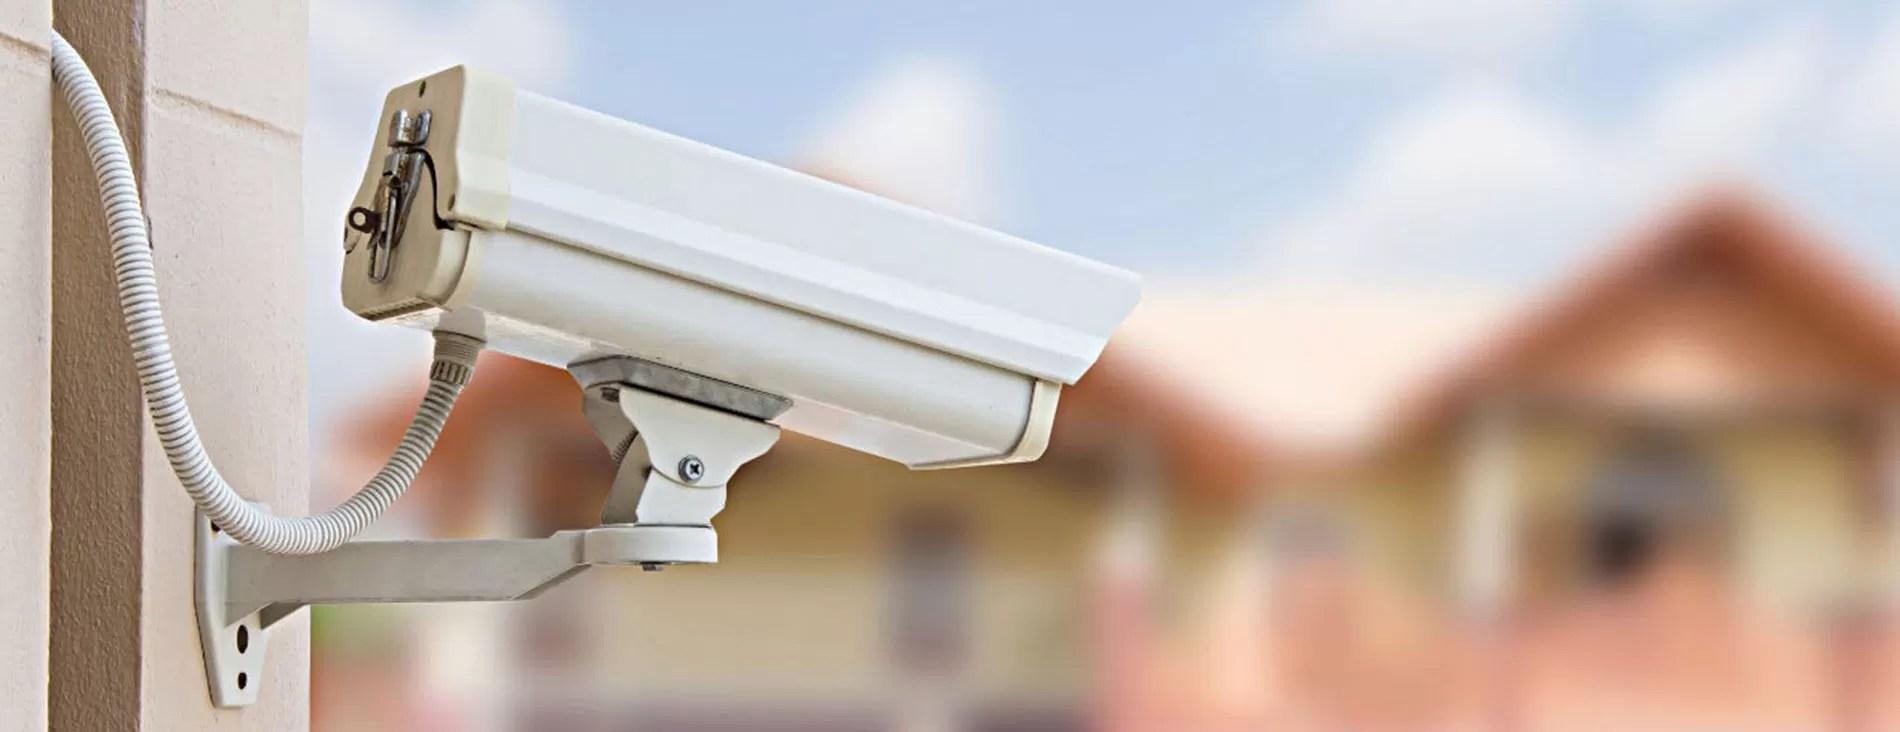 BBG security camera Orangeville